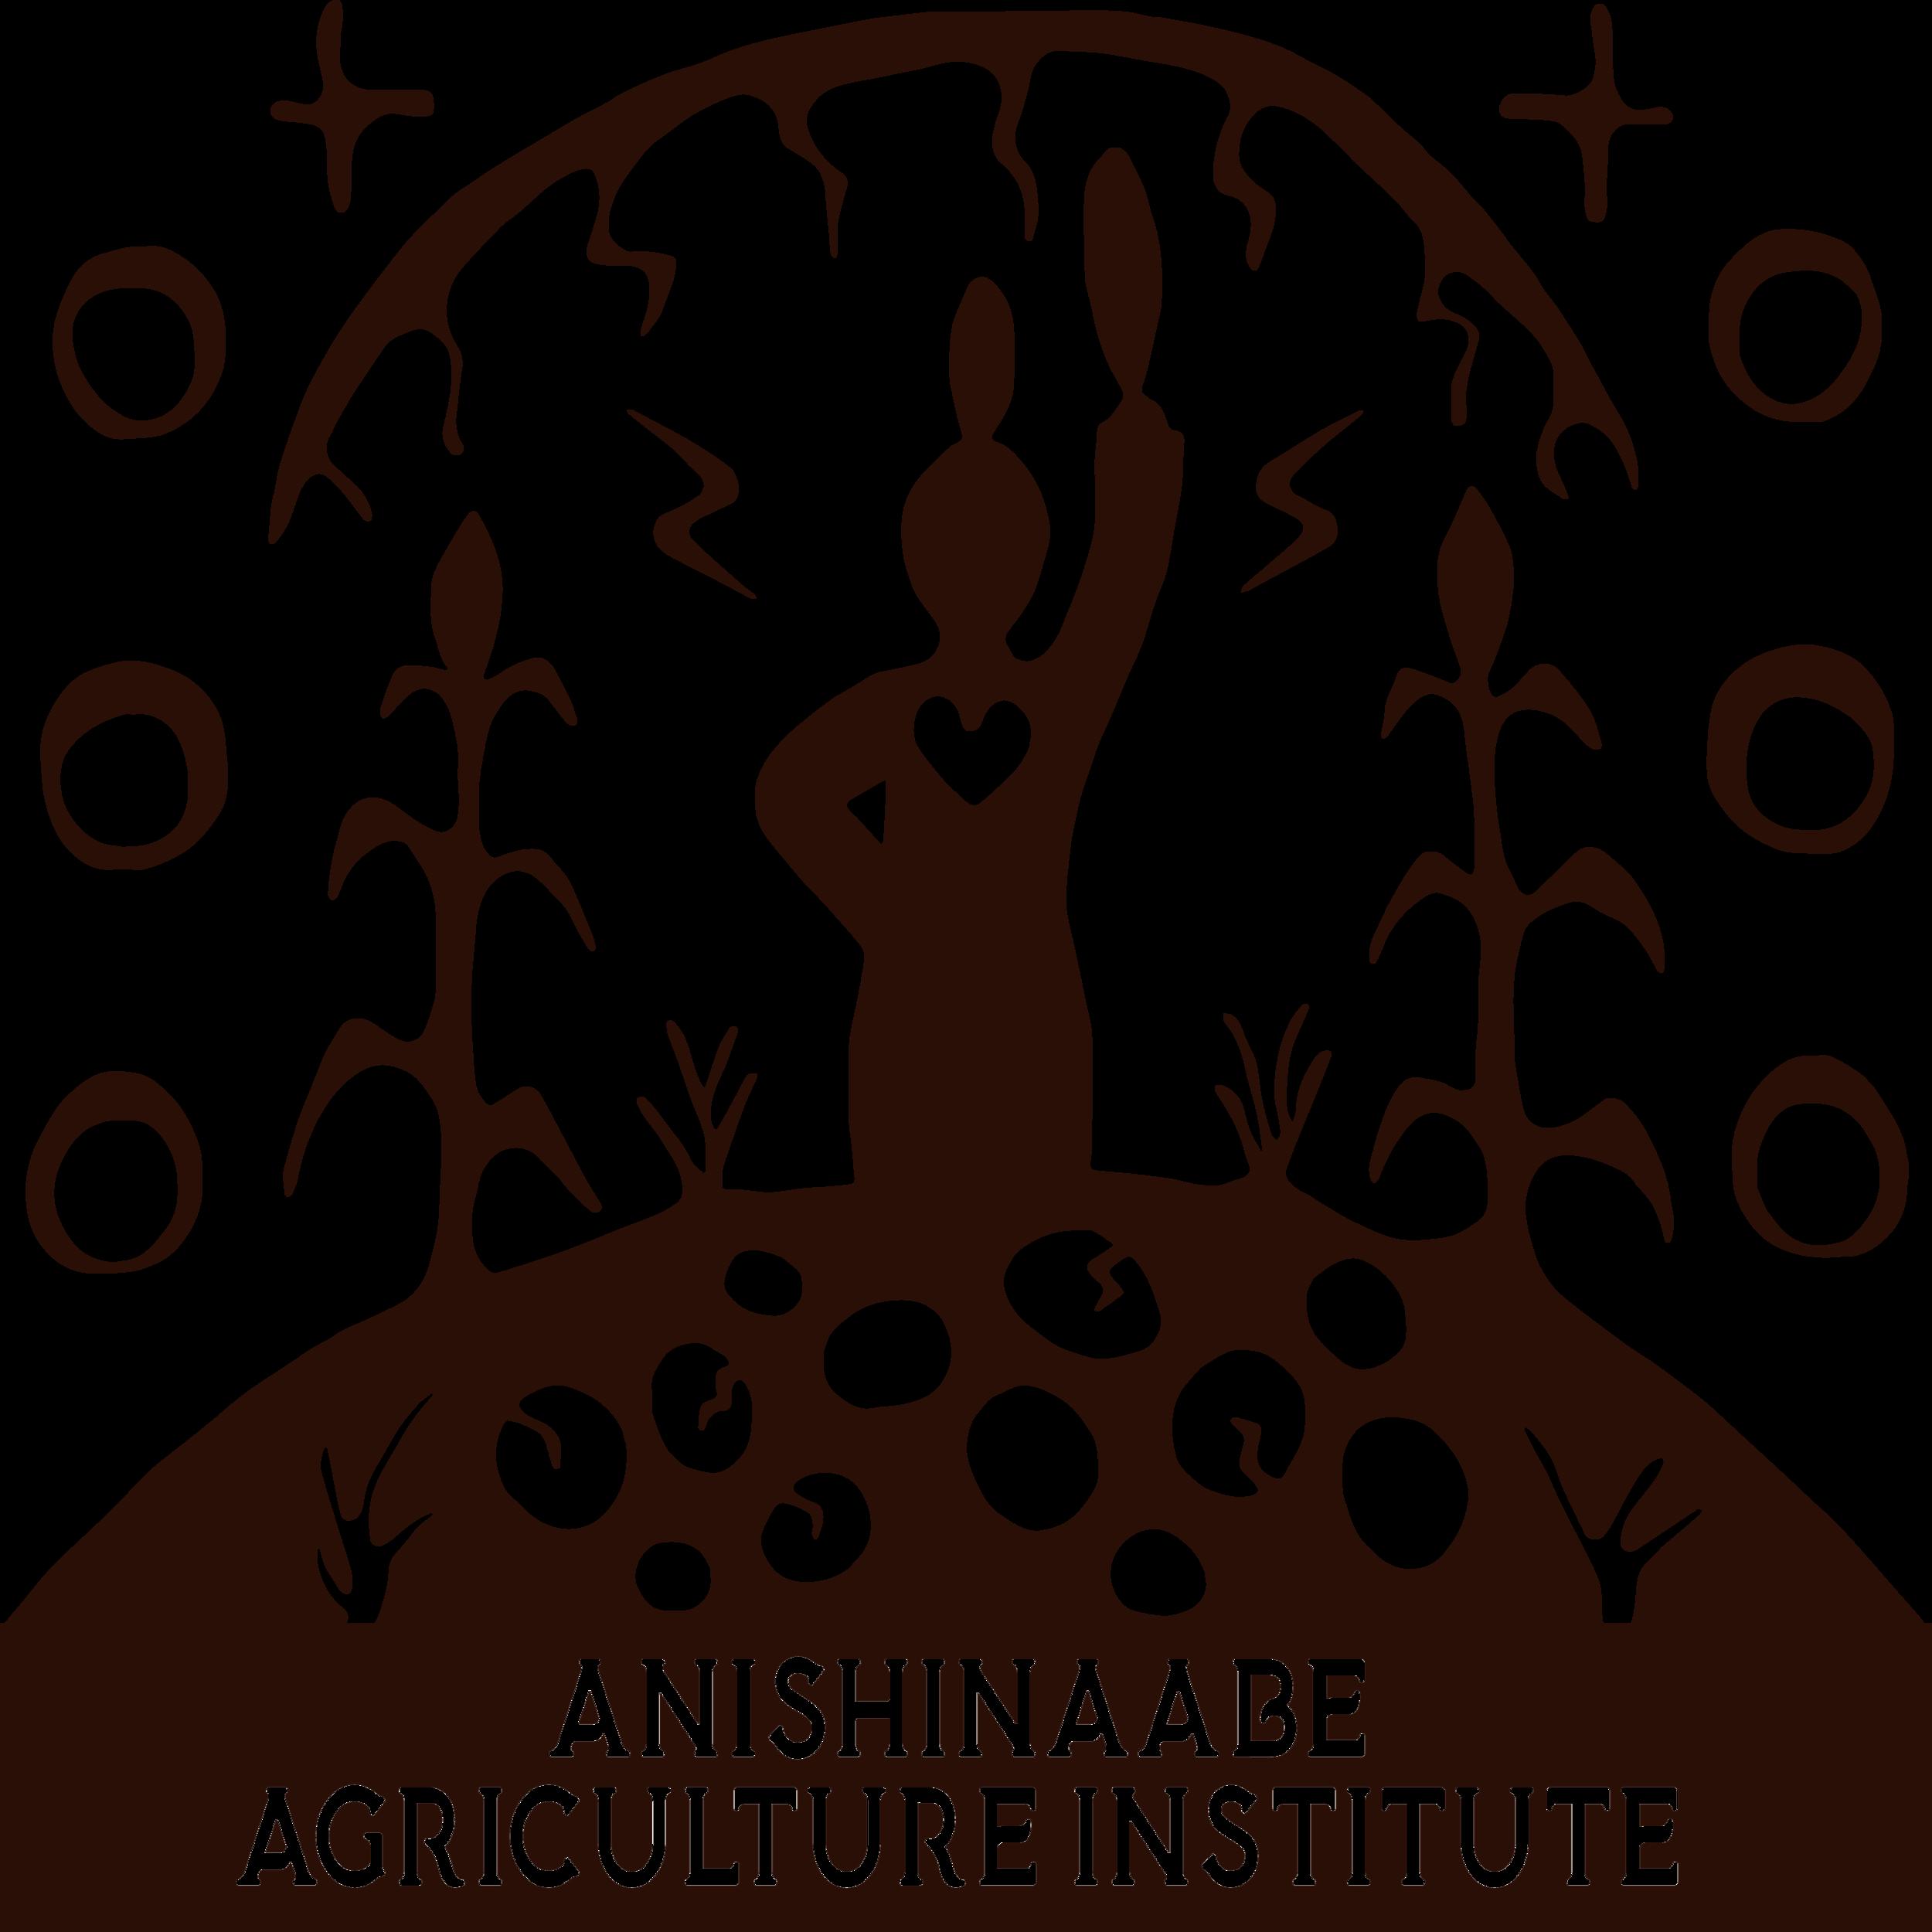 Anishinaabe Agriculture Institute - Partner Programs